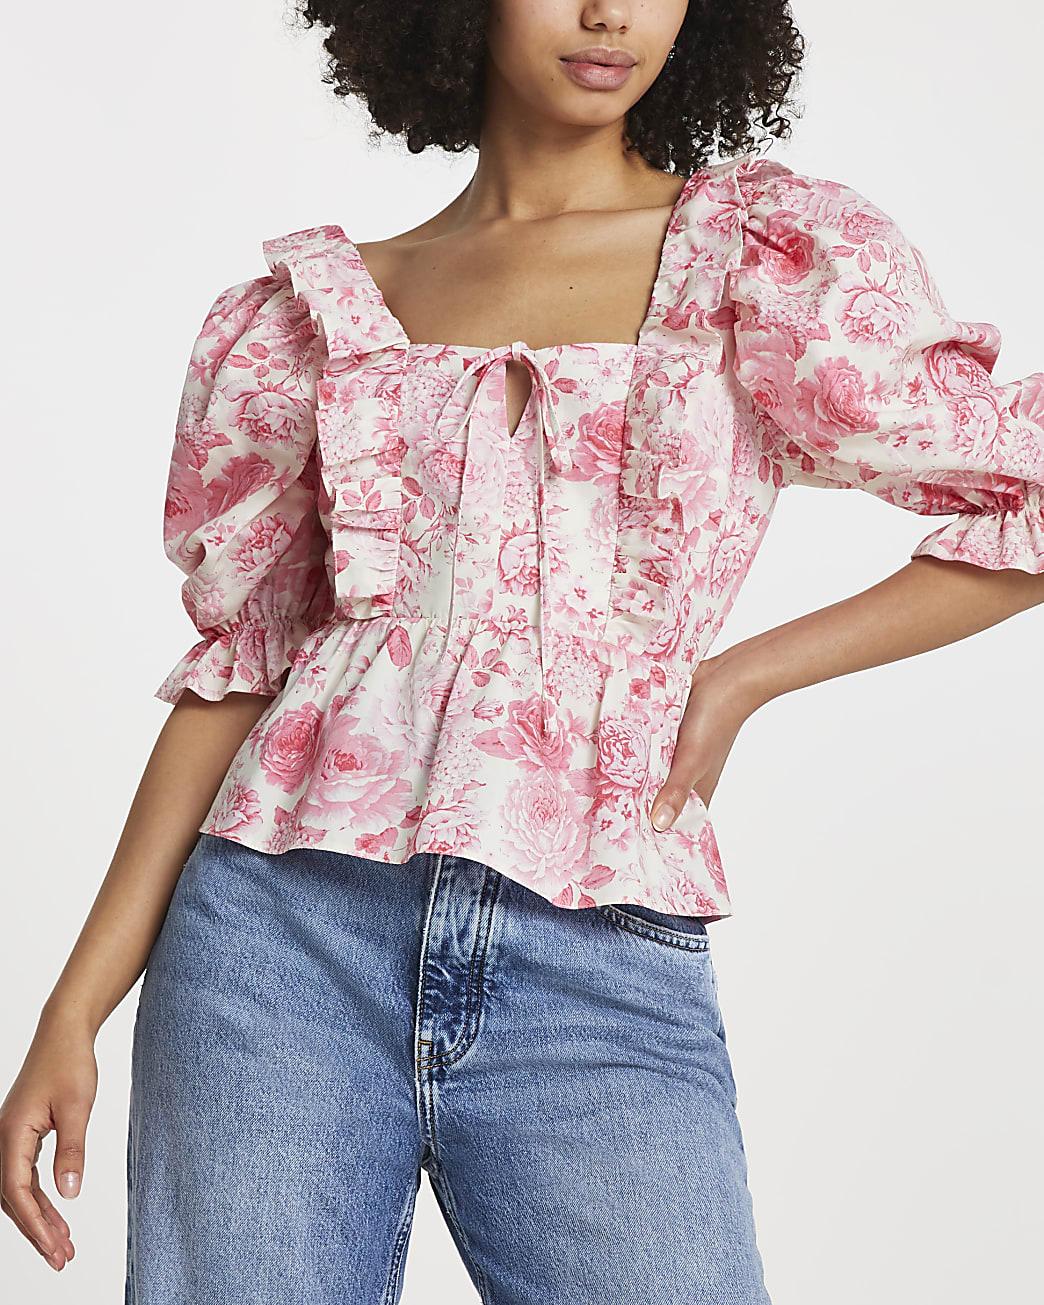 Pink floral frill hem blouse top